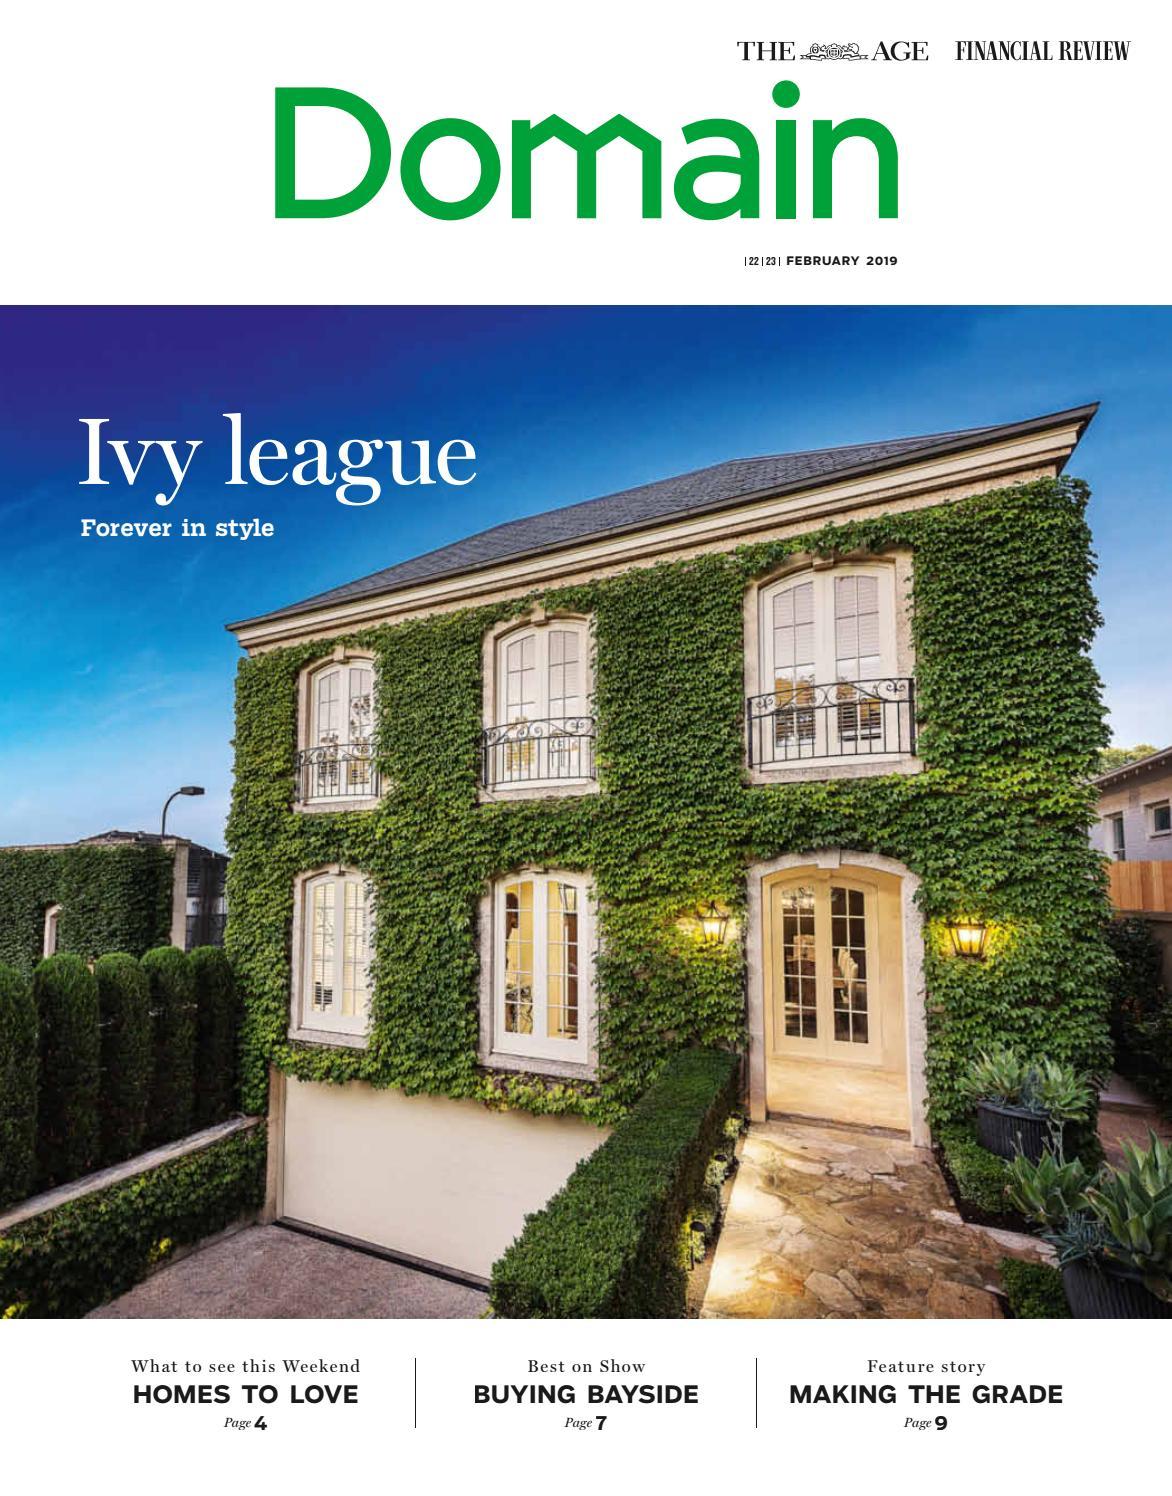 Domain The Age February 22 February 23 2019 By Domain Magazines Issuu